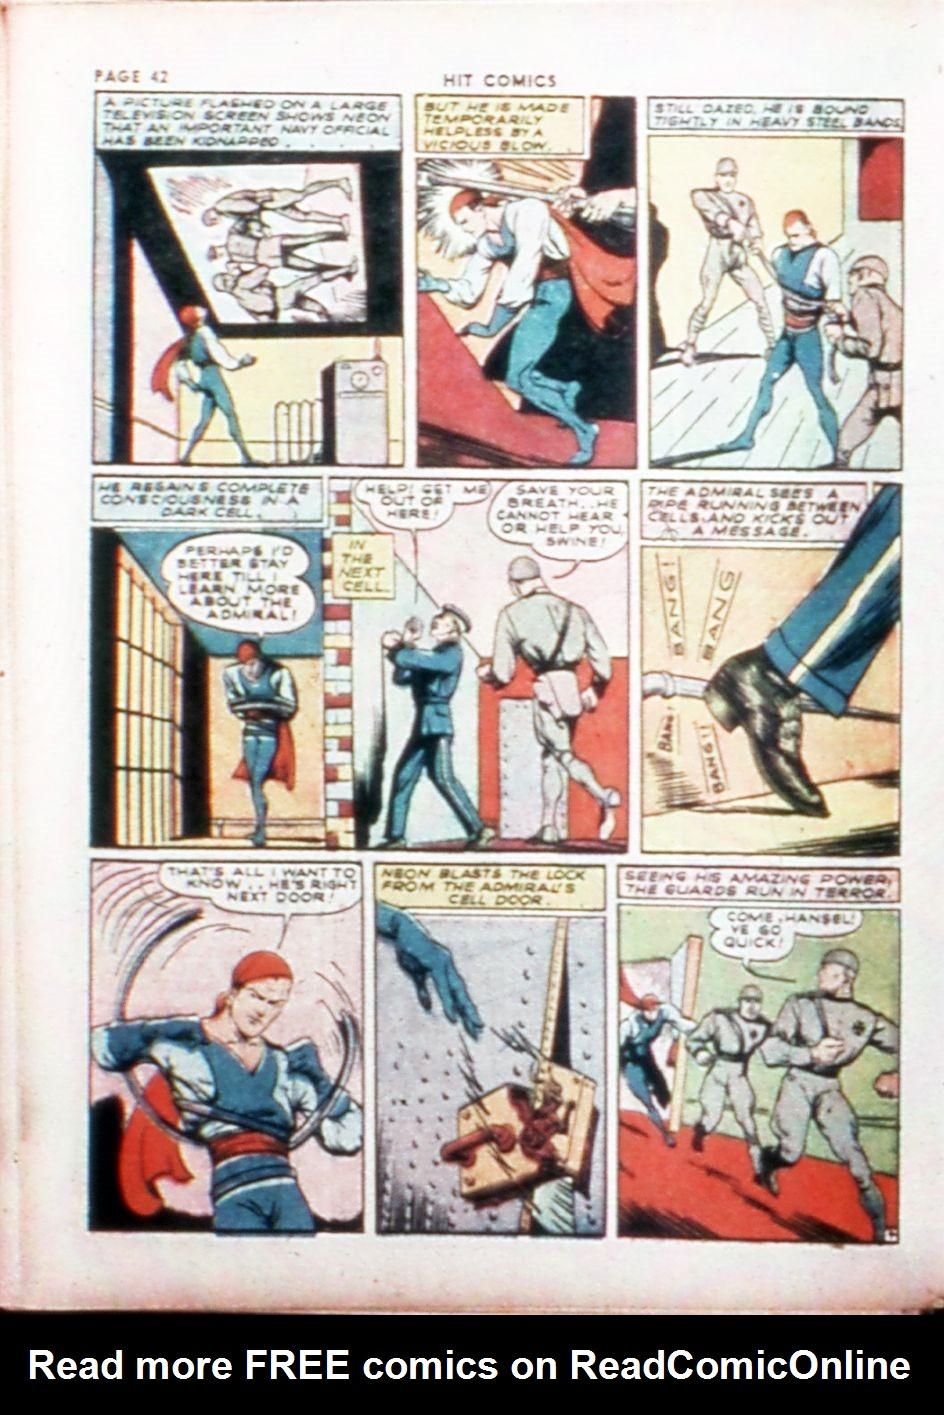 Read online Hit Comics comic -  Issue #14 - 44